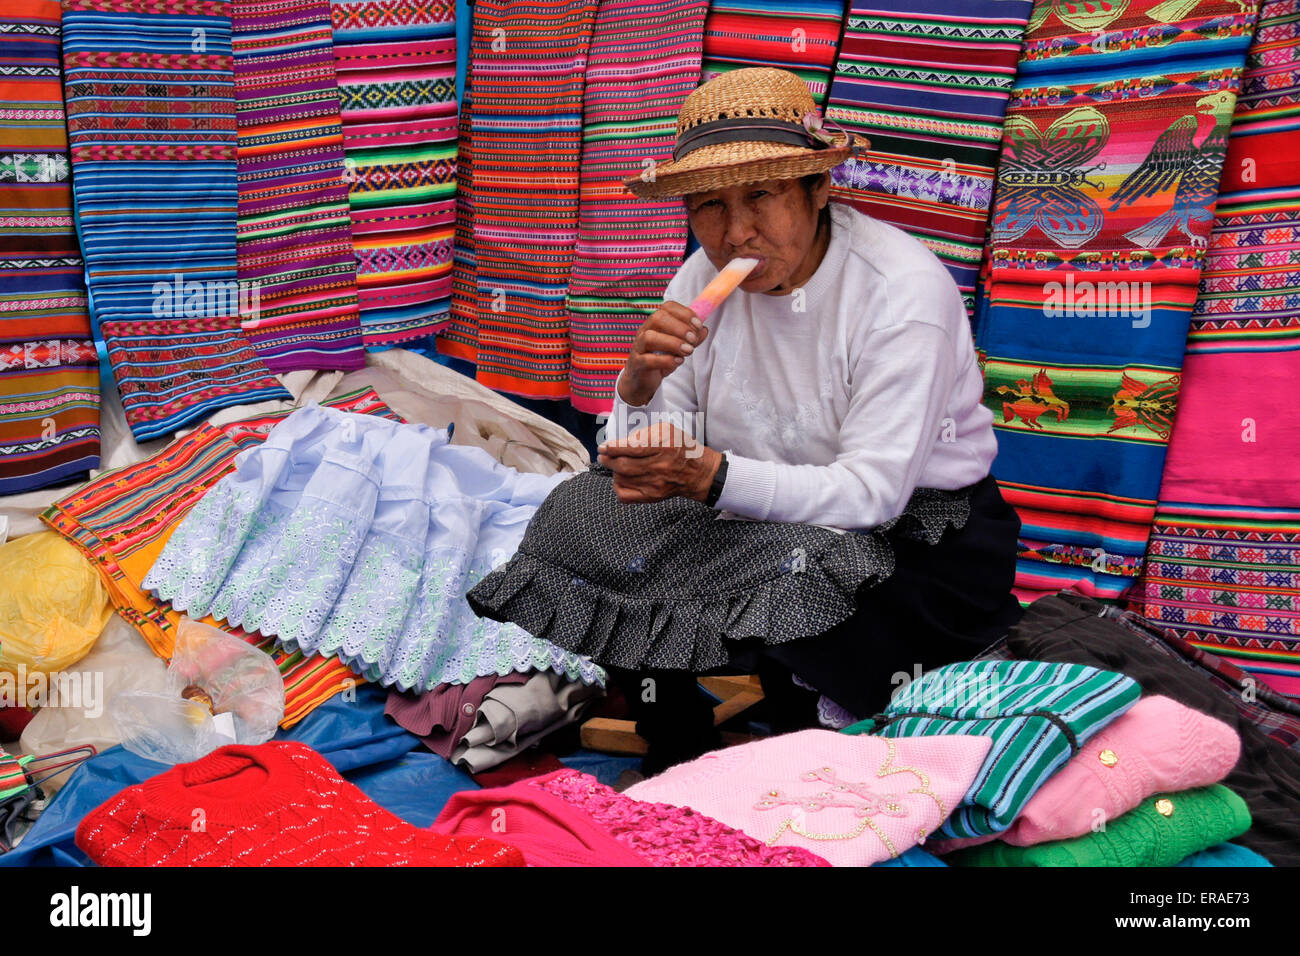 Woman selling clothing and textiles at Sunday market, Quiquijana (near Cuzco), Peru - Stock Image